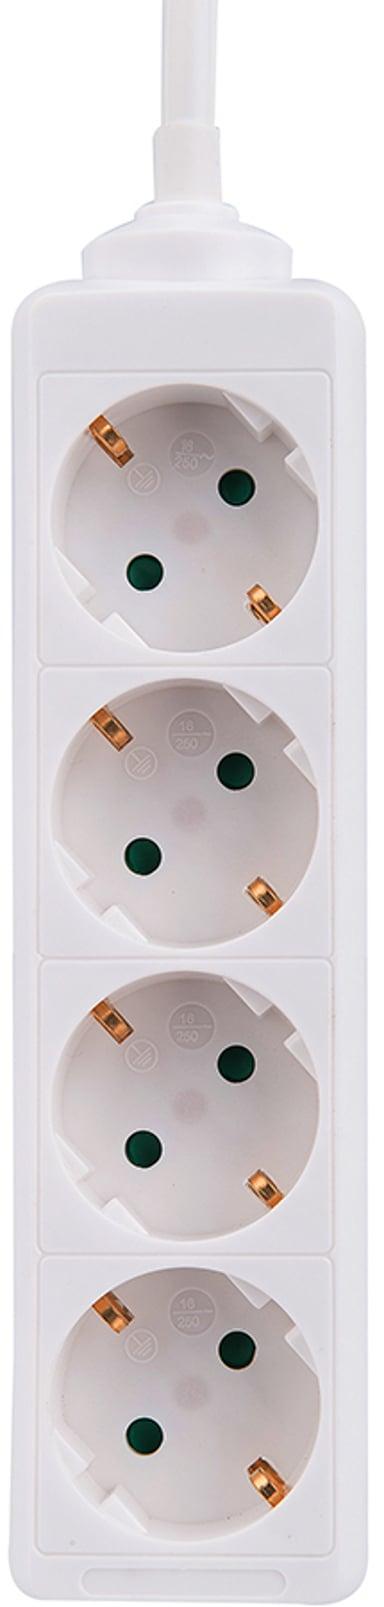 Prokord Prokord Power Socket 4Xsocket 1.5m White 4kpl Power CEE 7/4